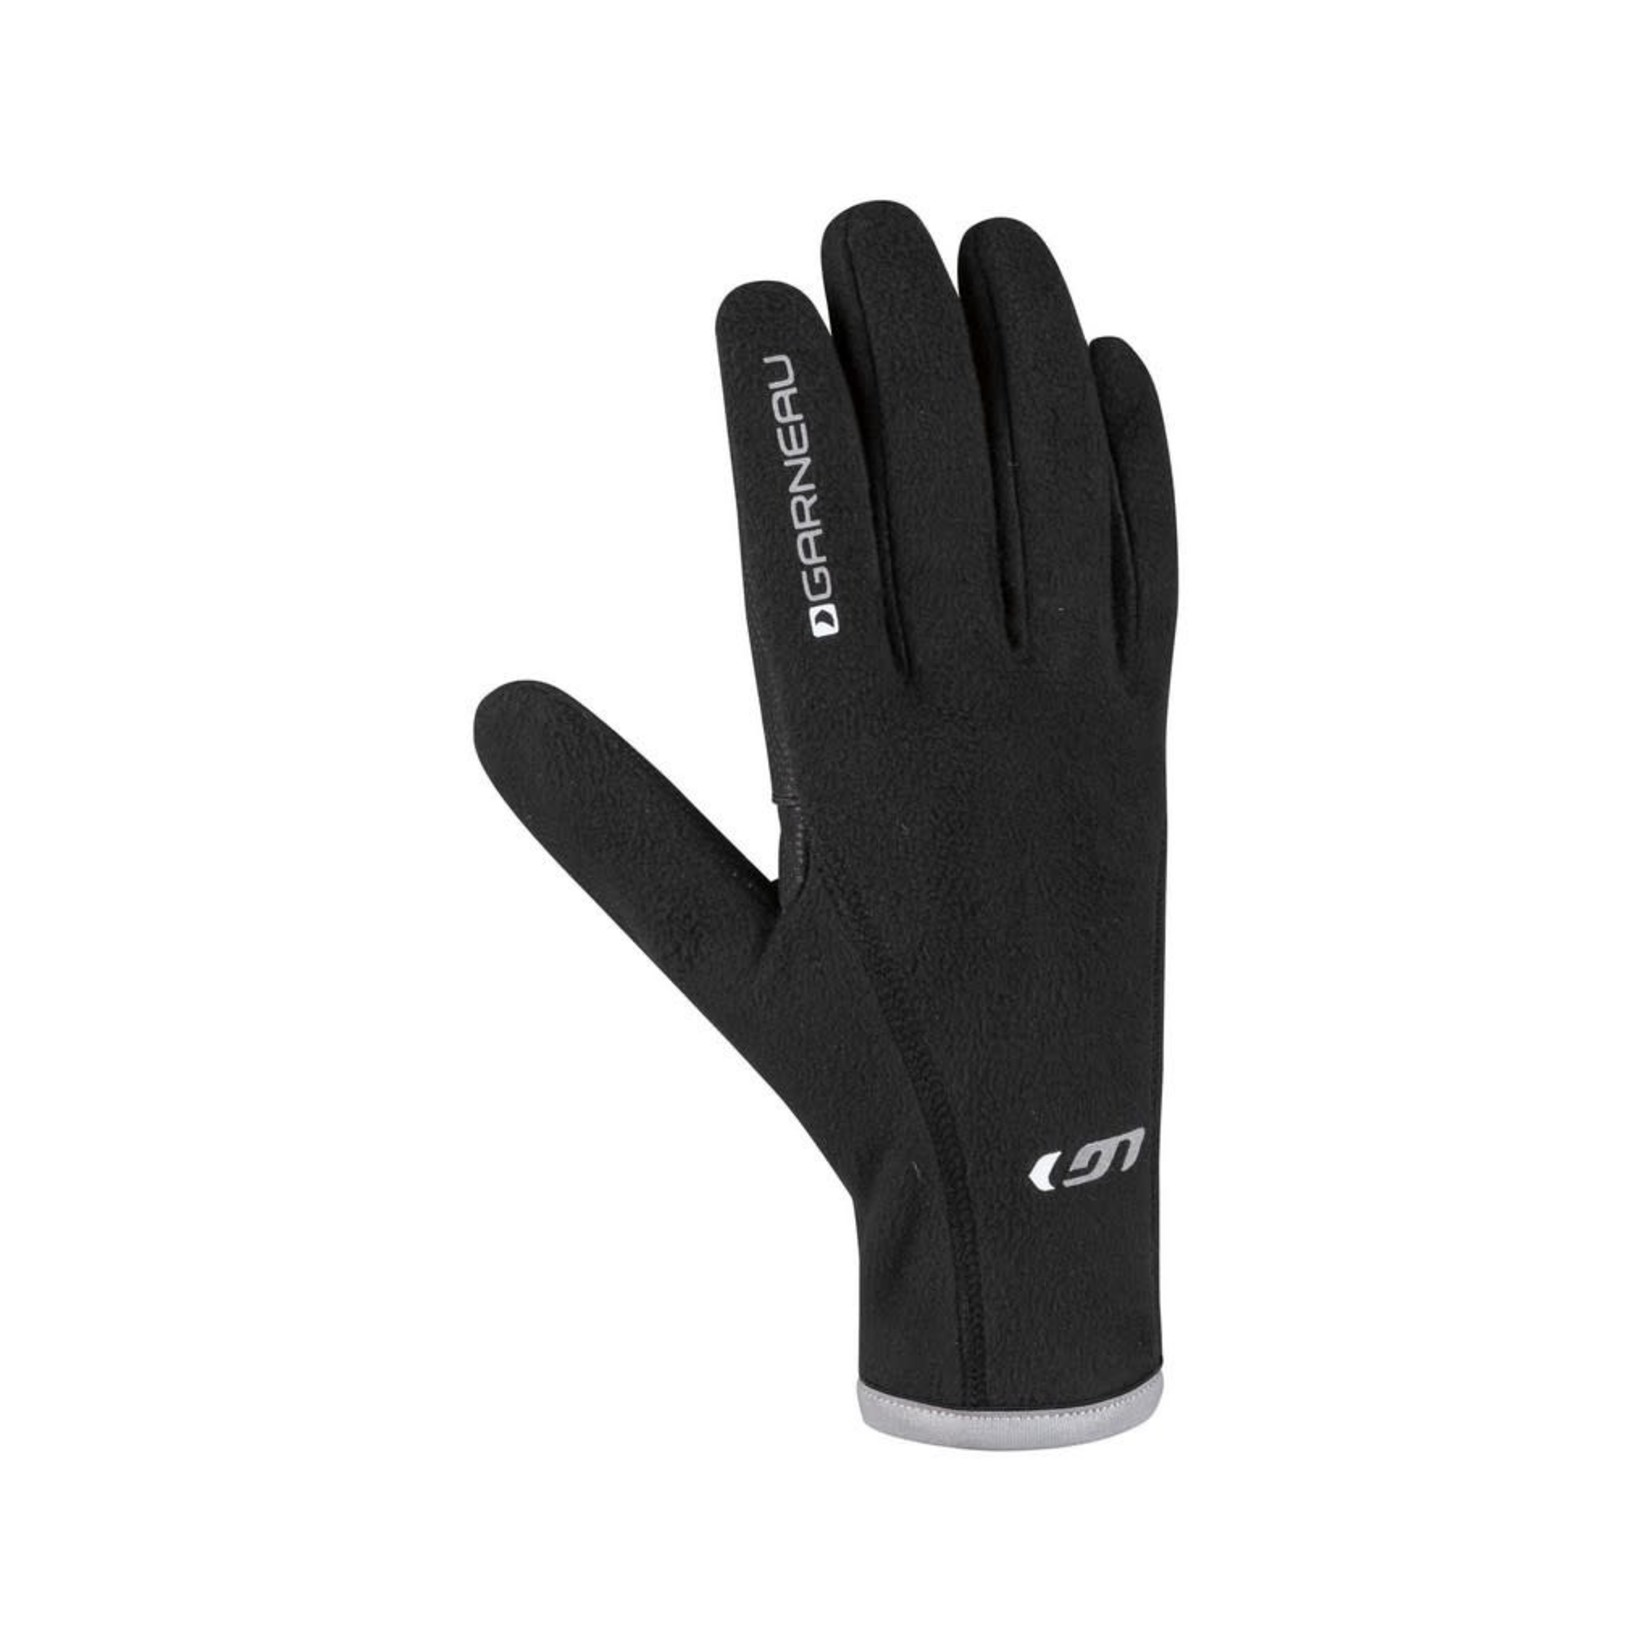 Louis Garneau Gloves Louis Garnea Gel EX Pro